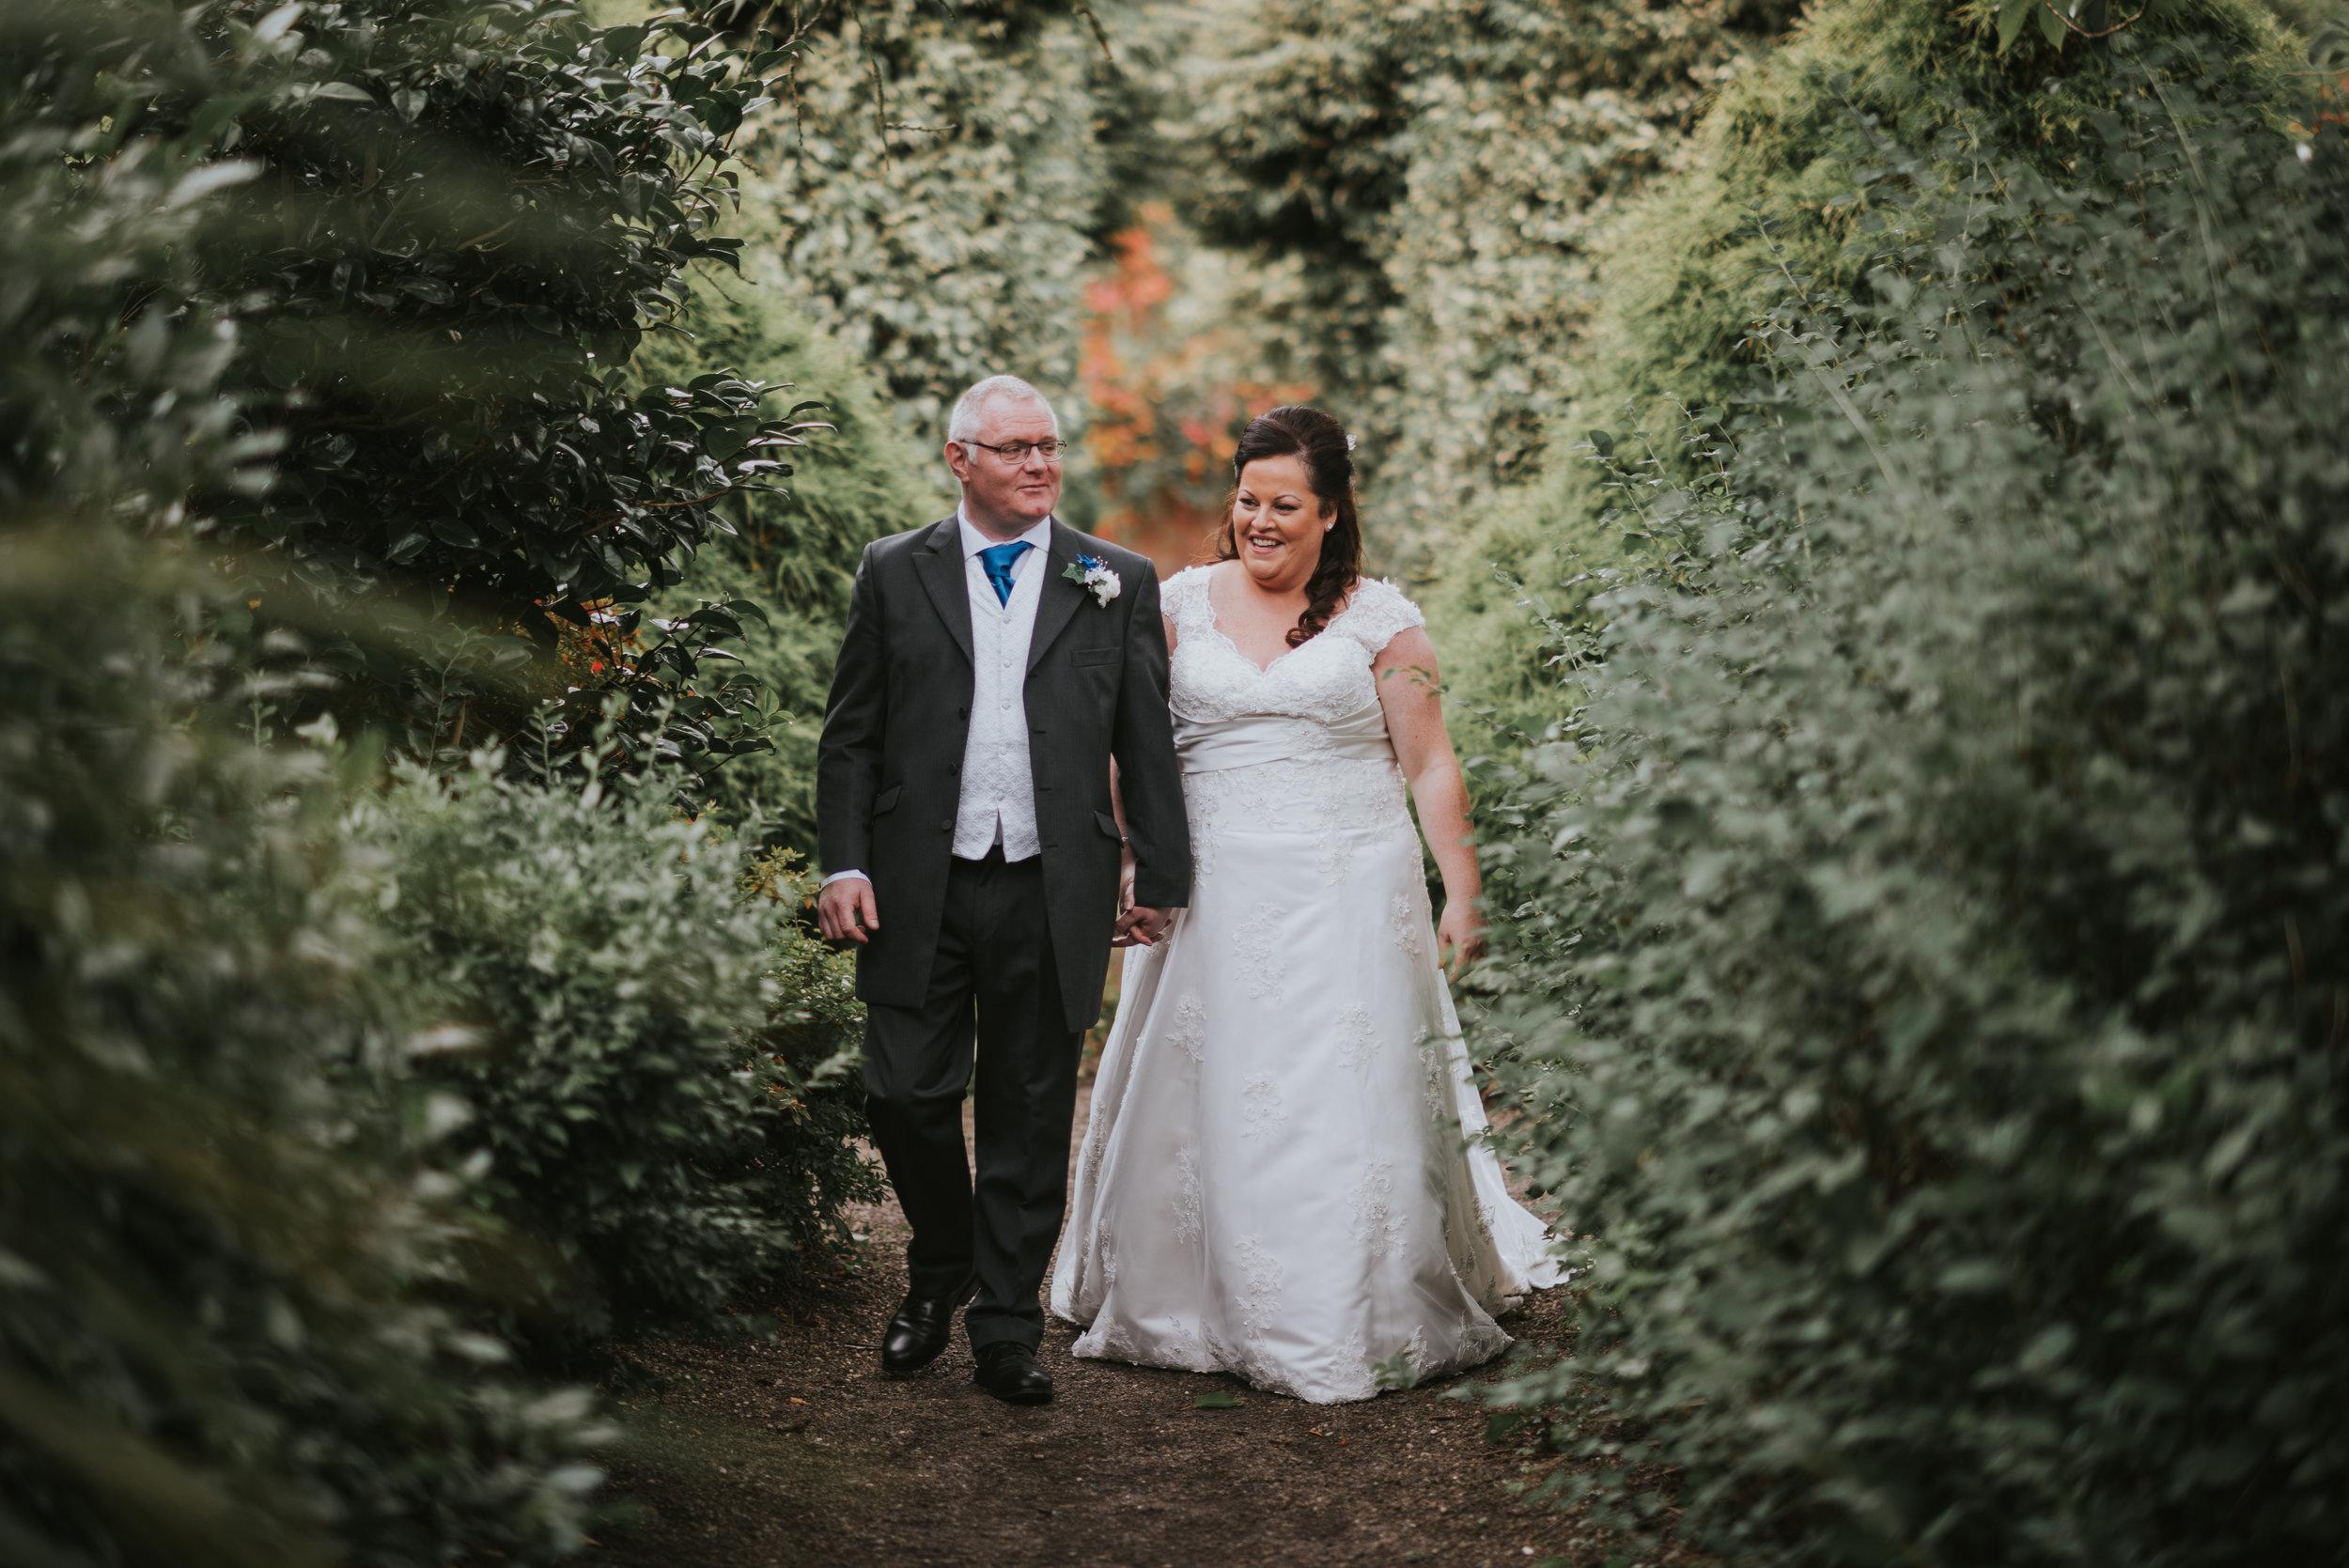 Lady dixon park belfast wedding photographer pure photo n.i bride and groom portrait